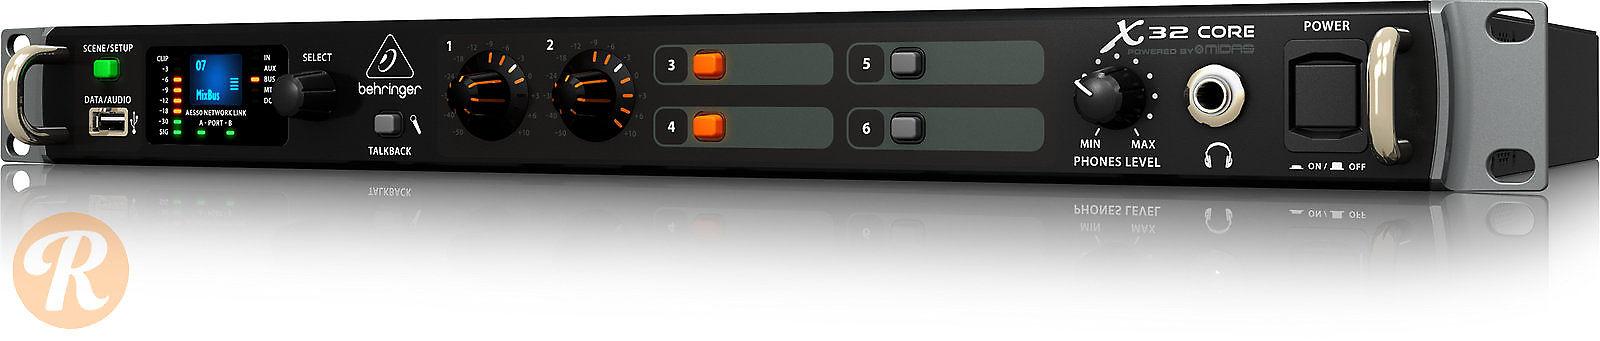 behringer x32 core 25 bus rackmount digital mixer reverb. Black Bedroom Furniture Sets. Home Design Ideas